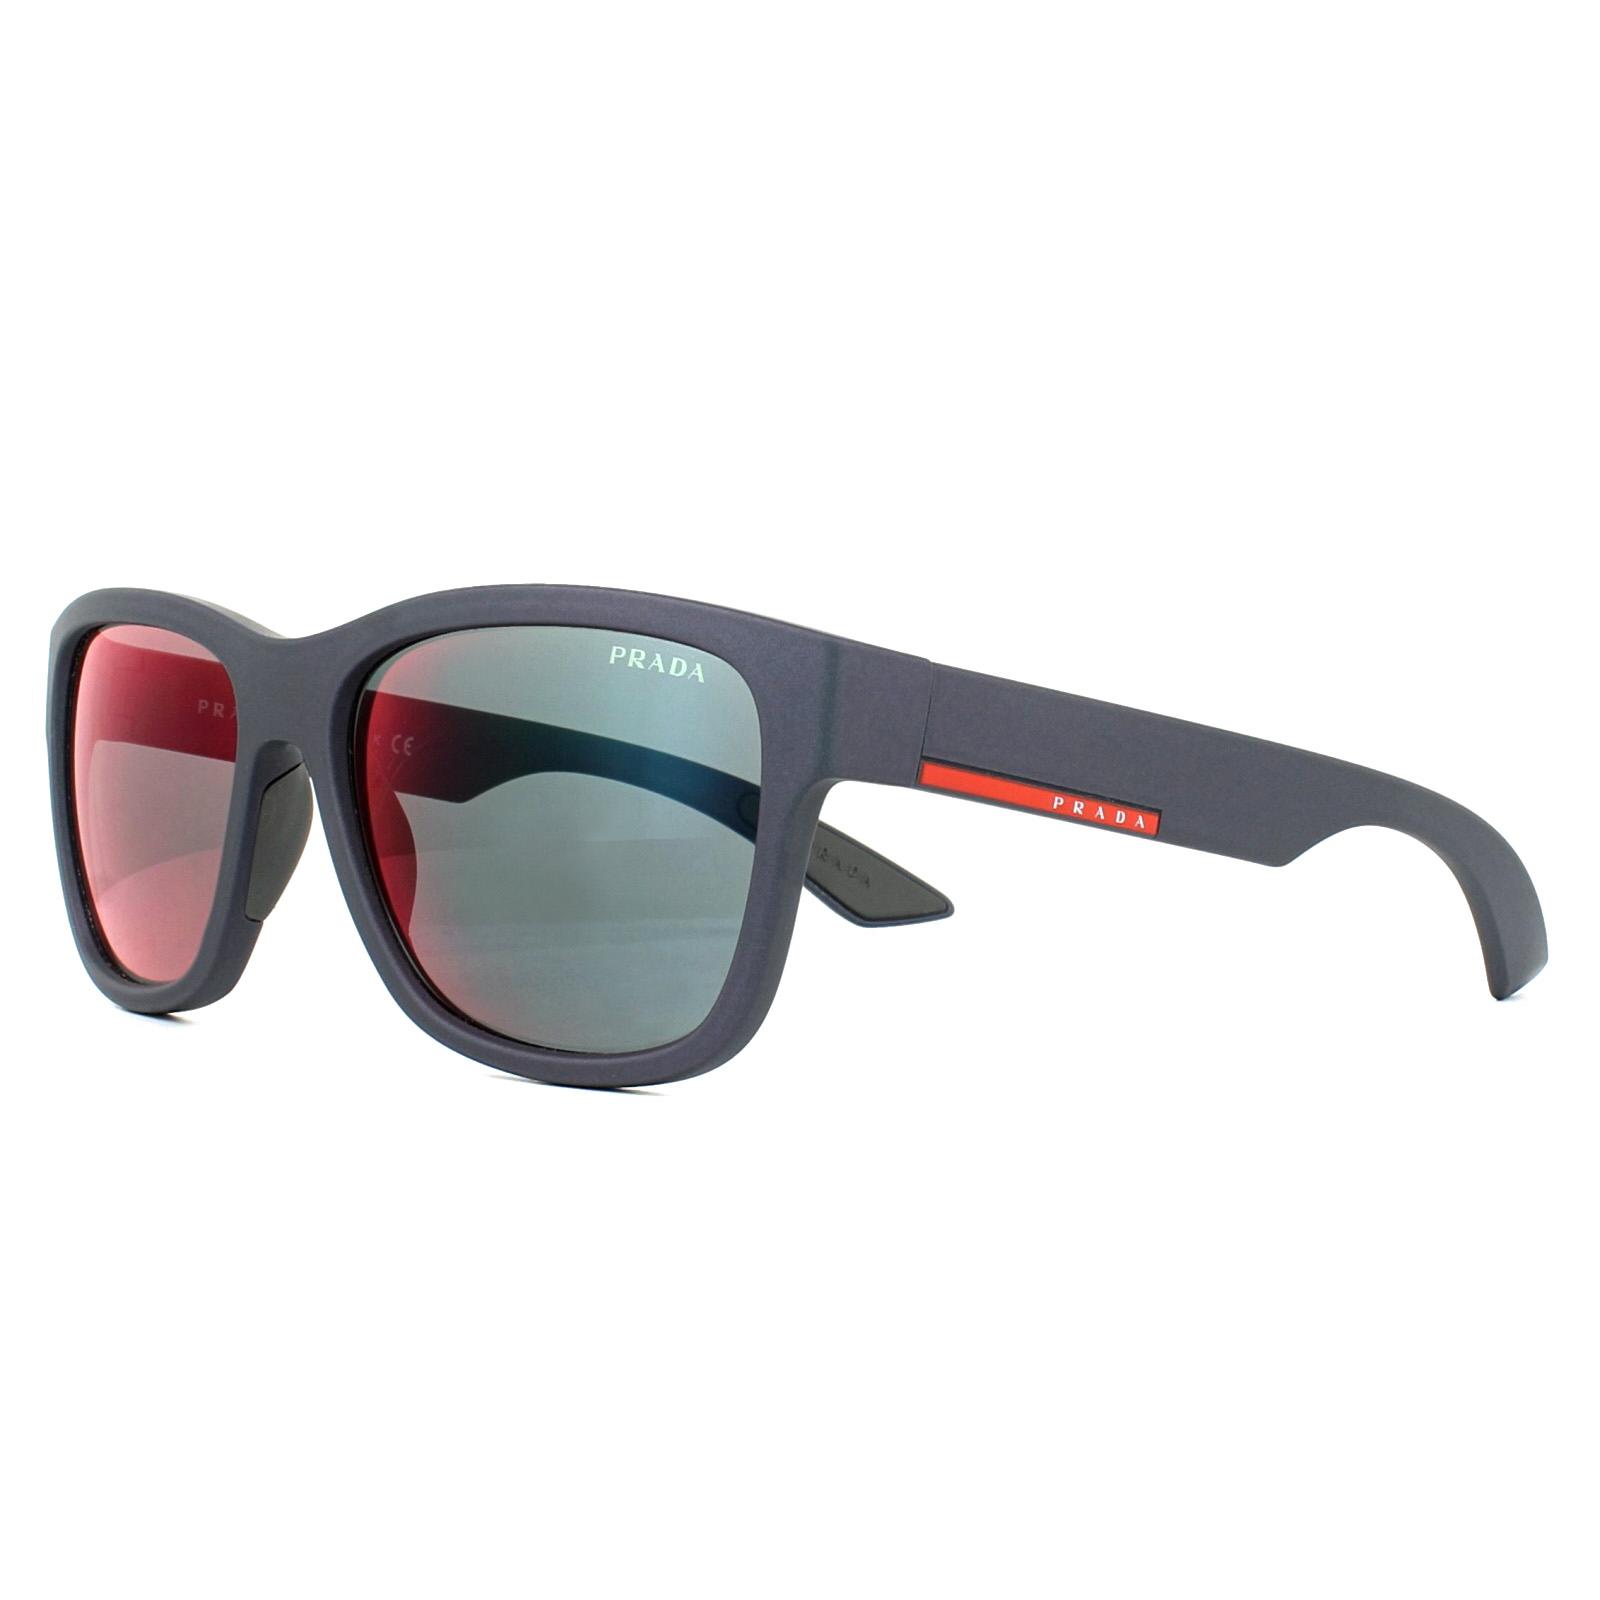 03qs Shot Sunglasses Prada Grey Rubber Details About Sport Red Mirror Ubx9q1 54AR3Ljq